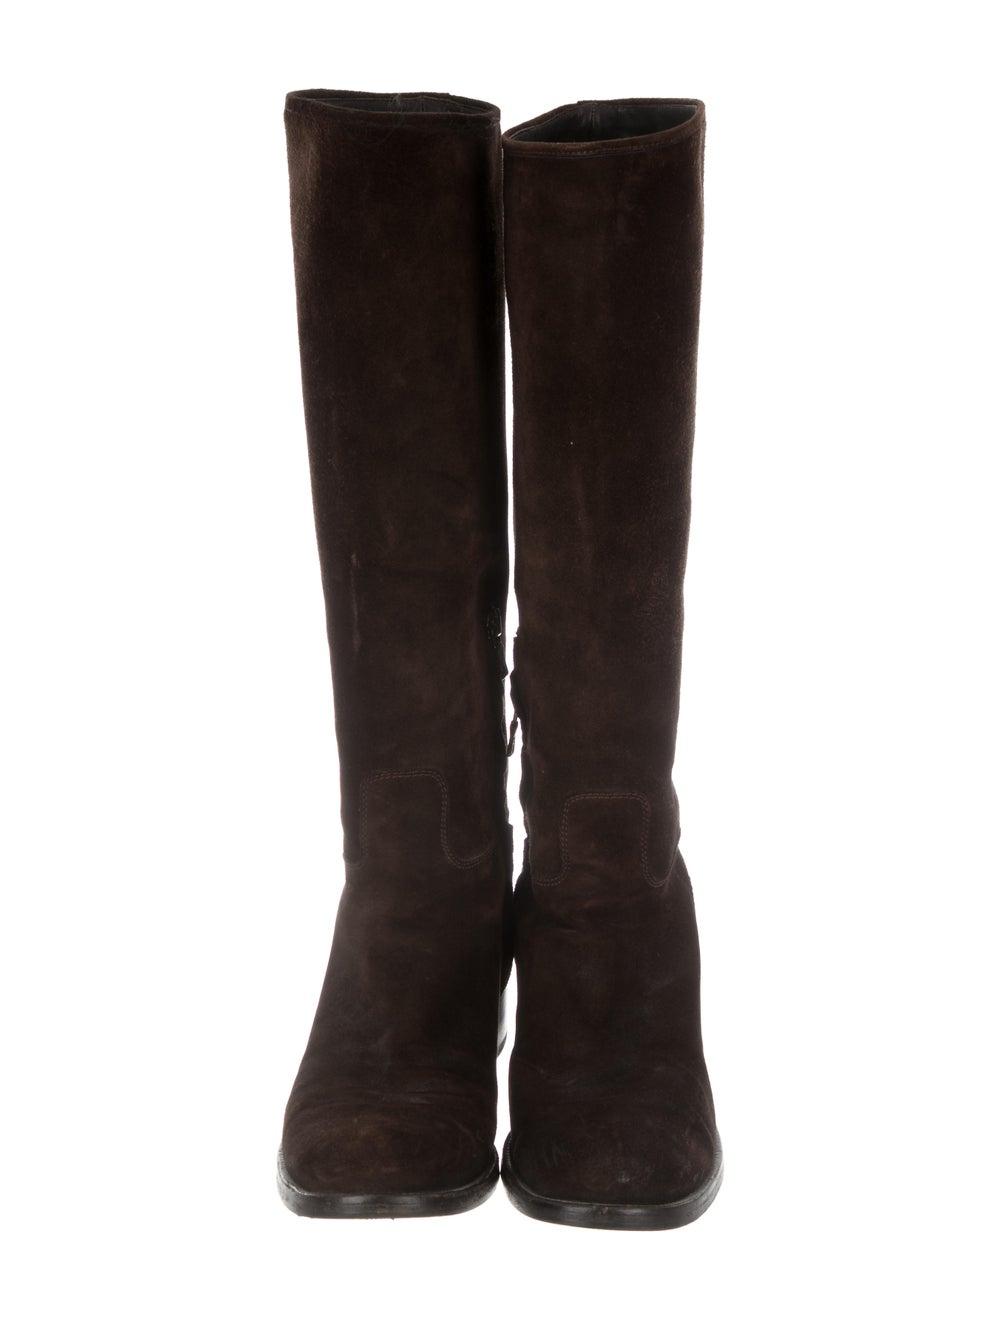 Prada Suede Knee-High Boots Brown - image 3